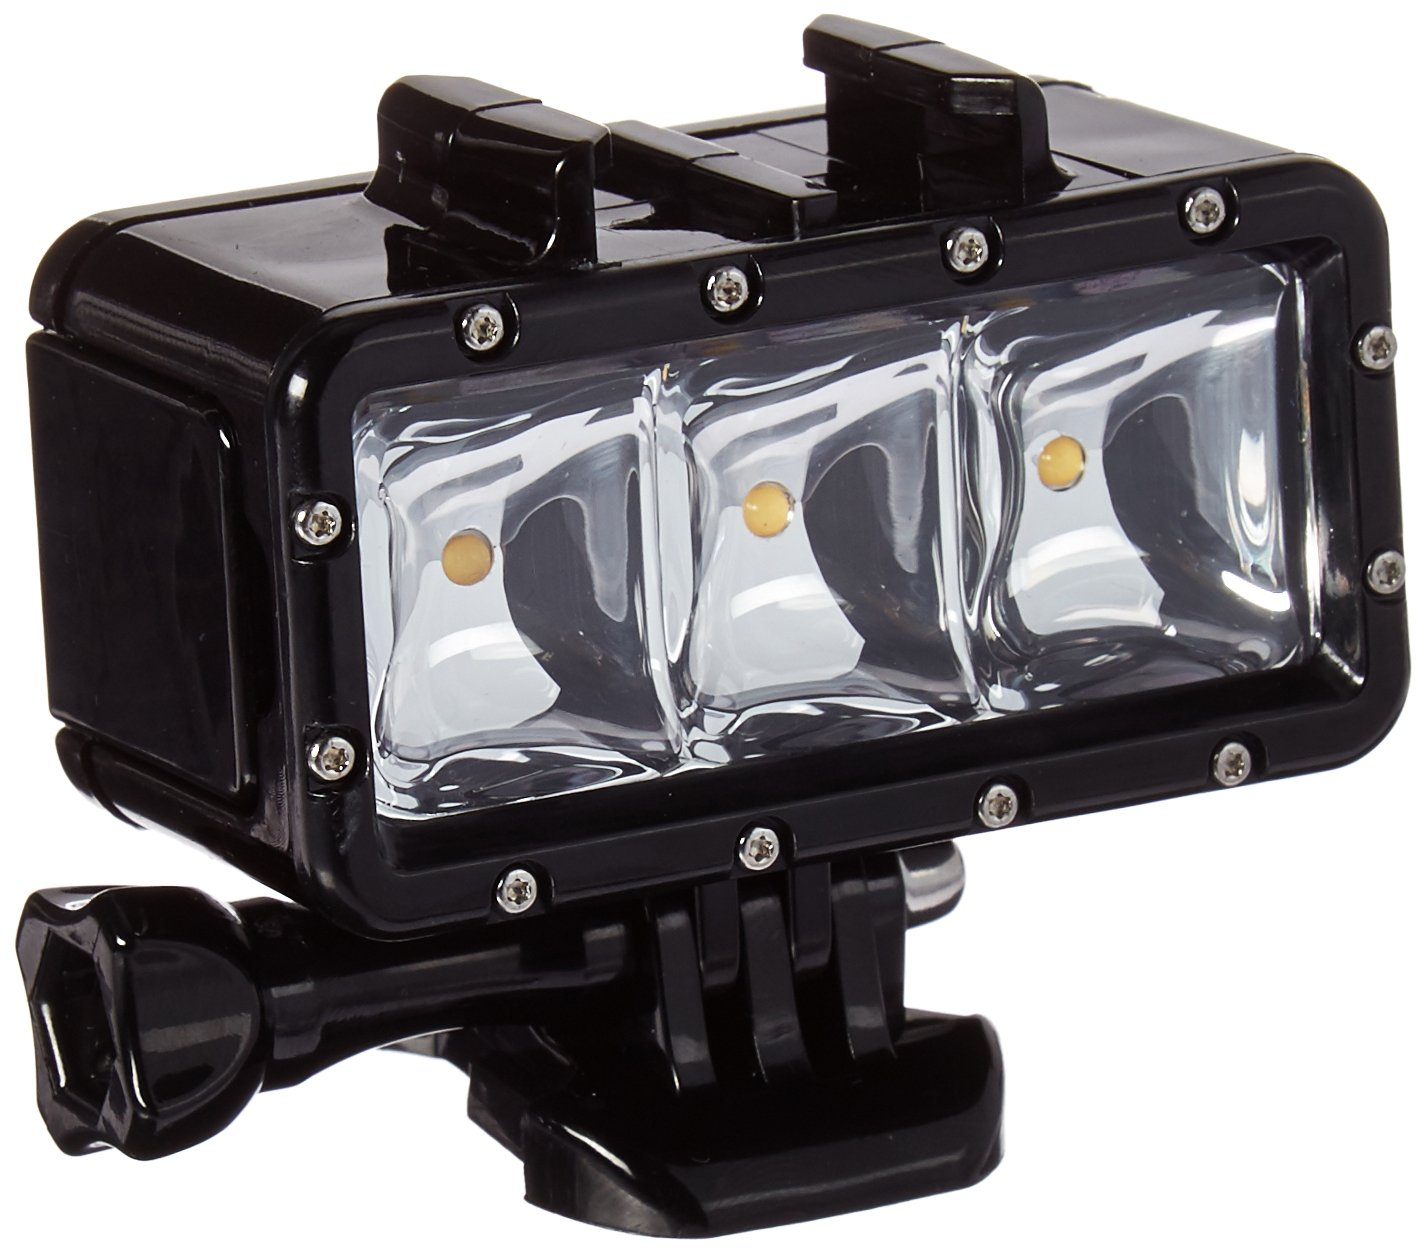 Bestshoot Underwater 30M LED Video Light for Gopro 4 3 3+ 2 1 Session